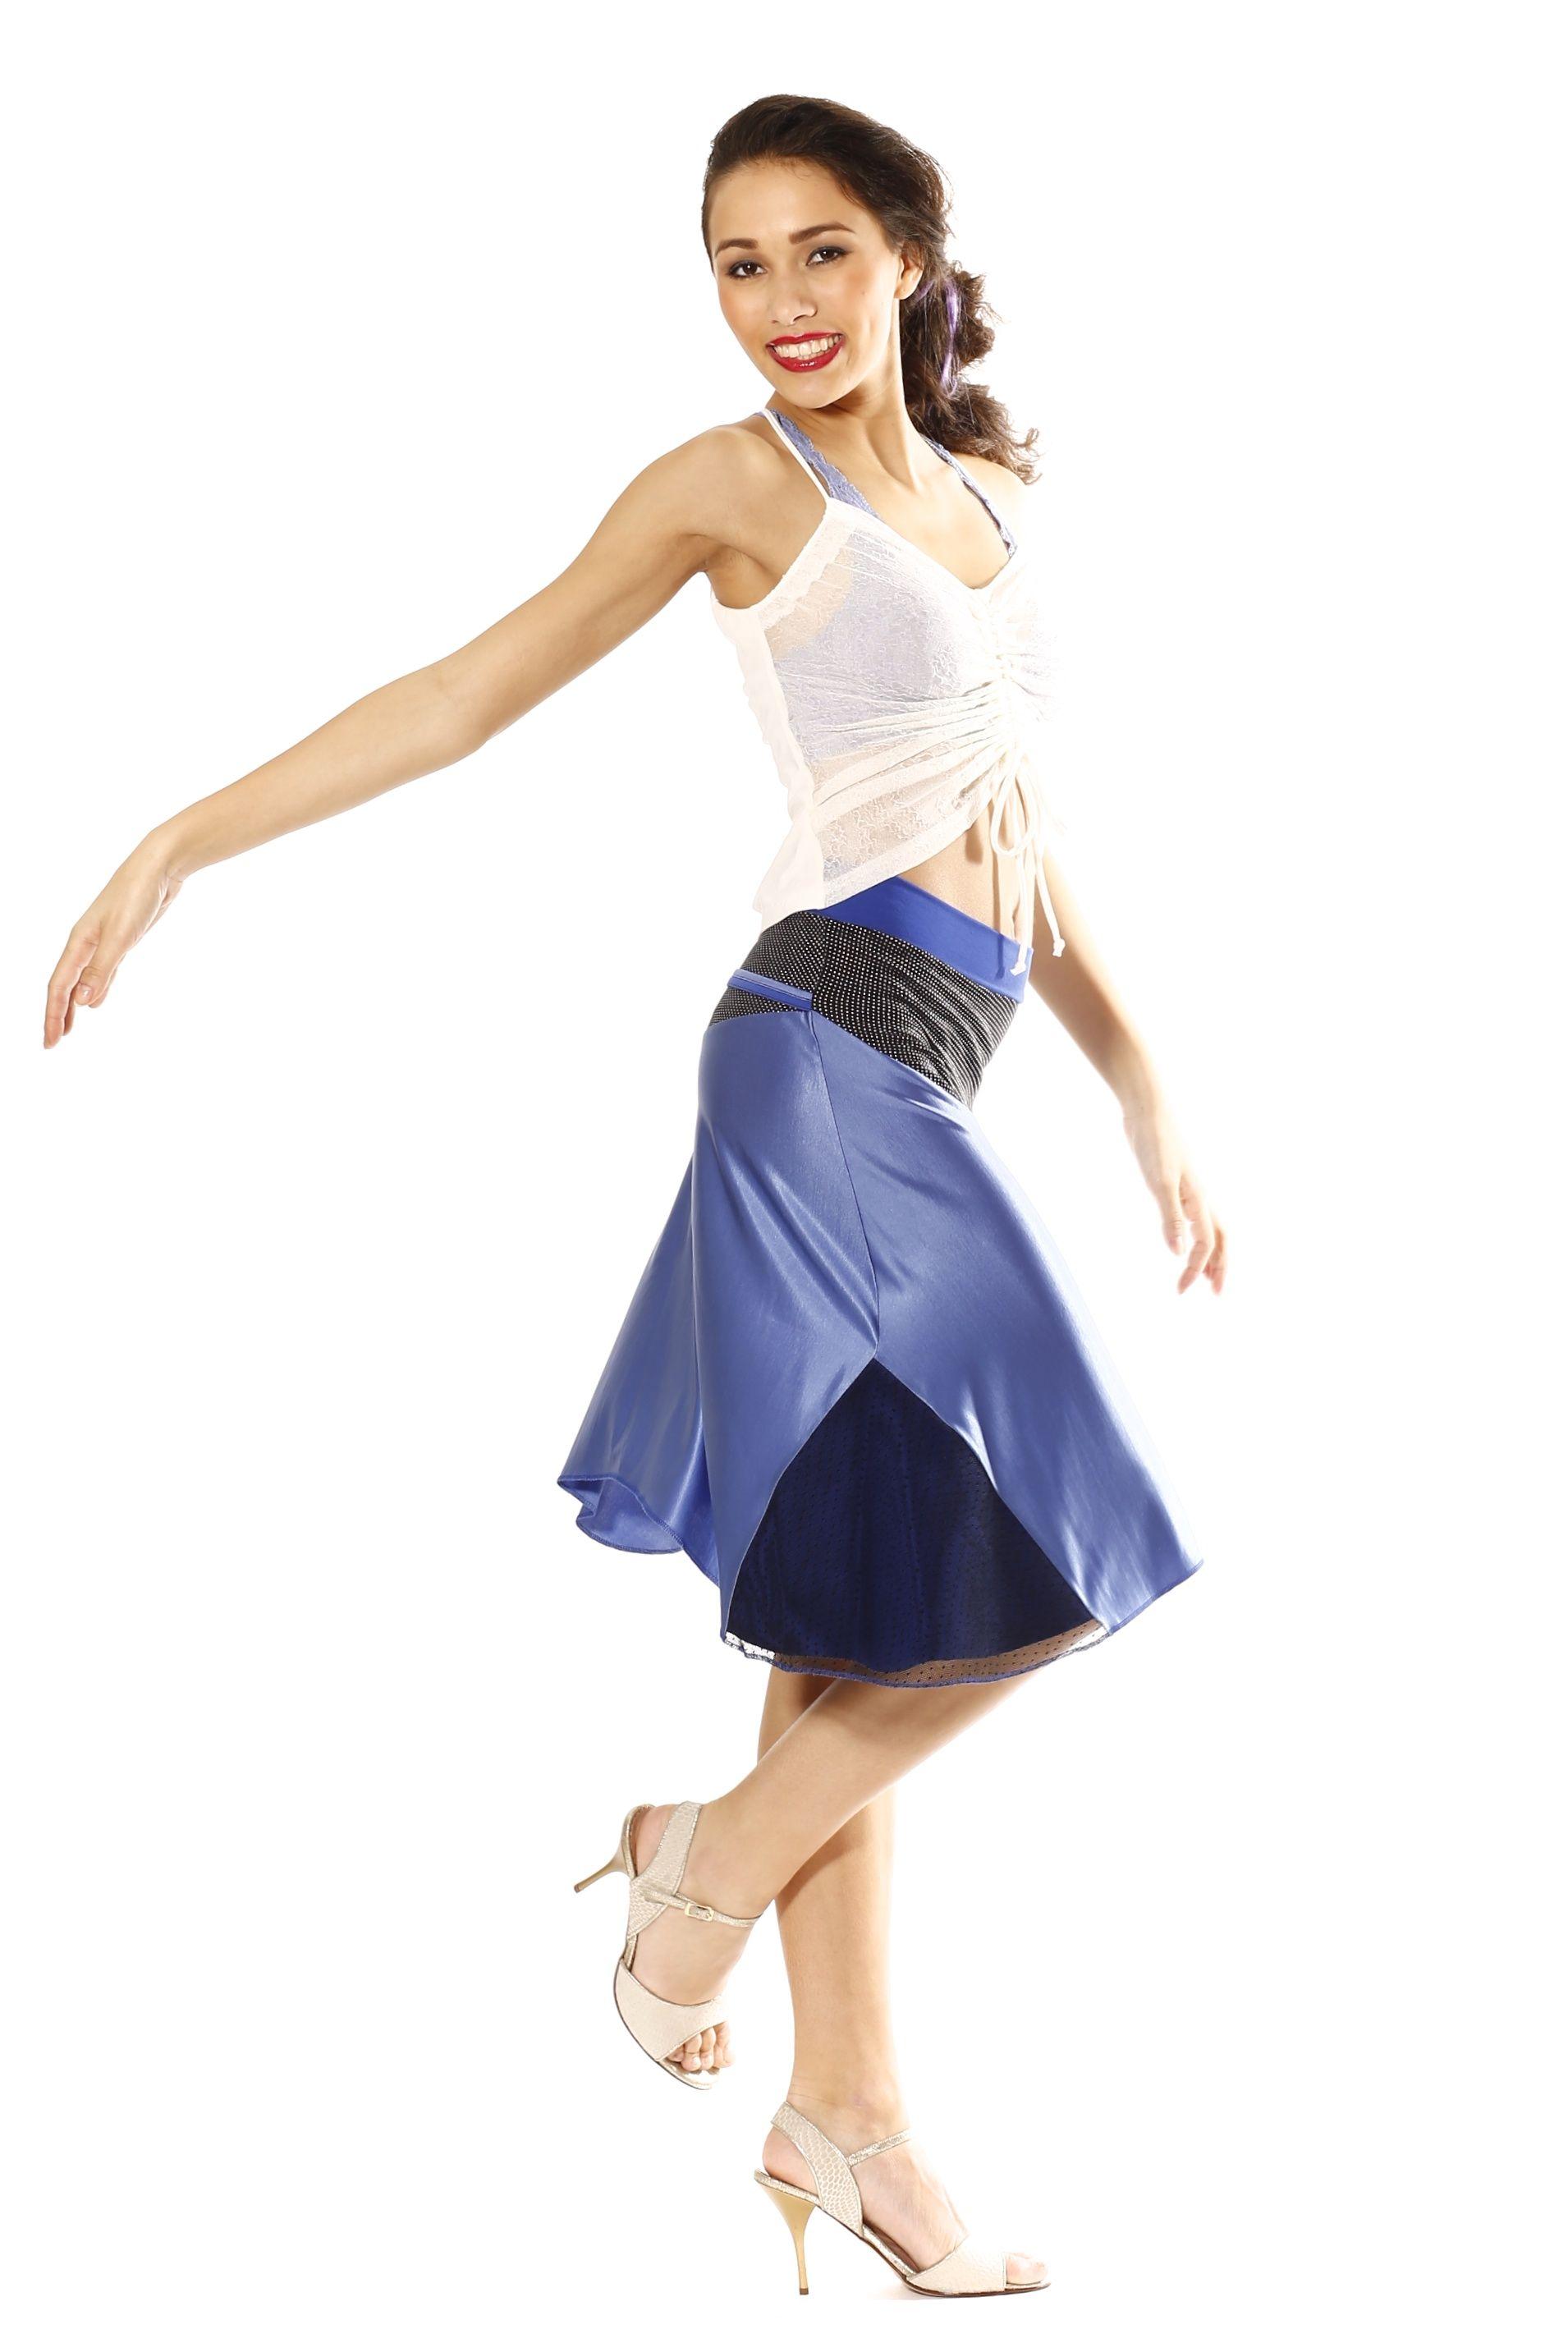 Под юбкой танцев онлайн